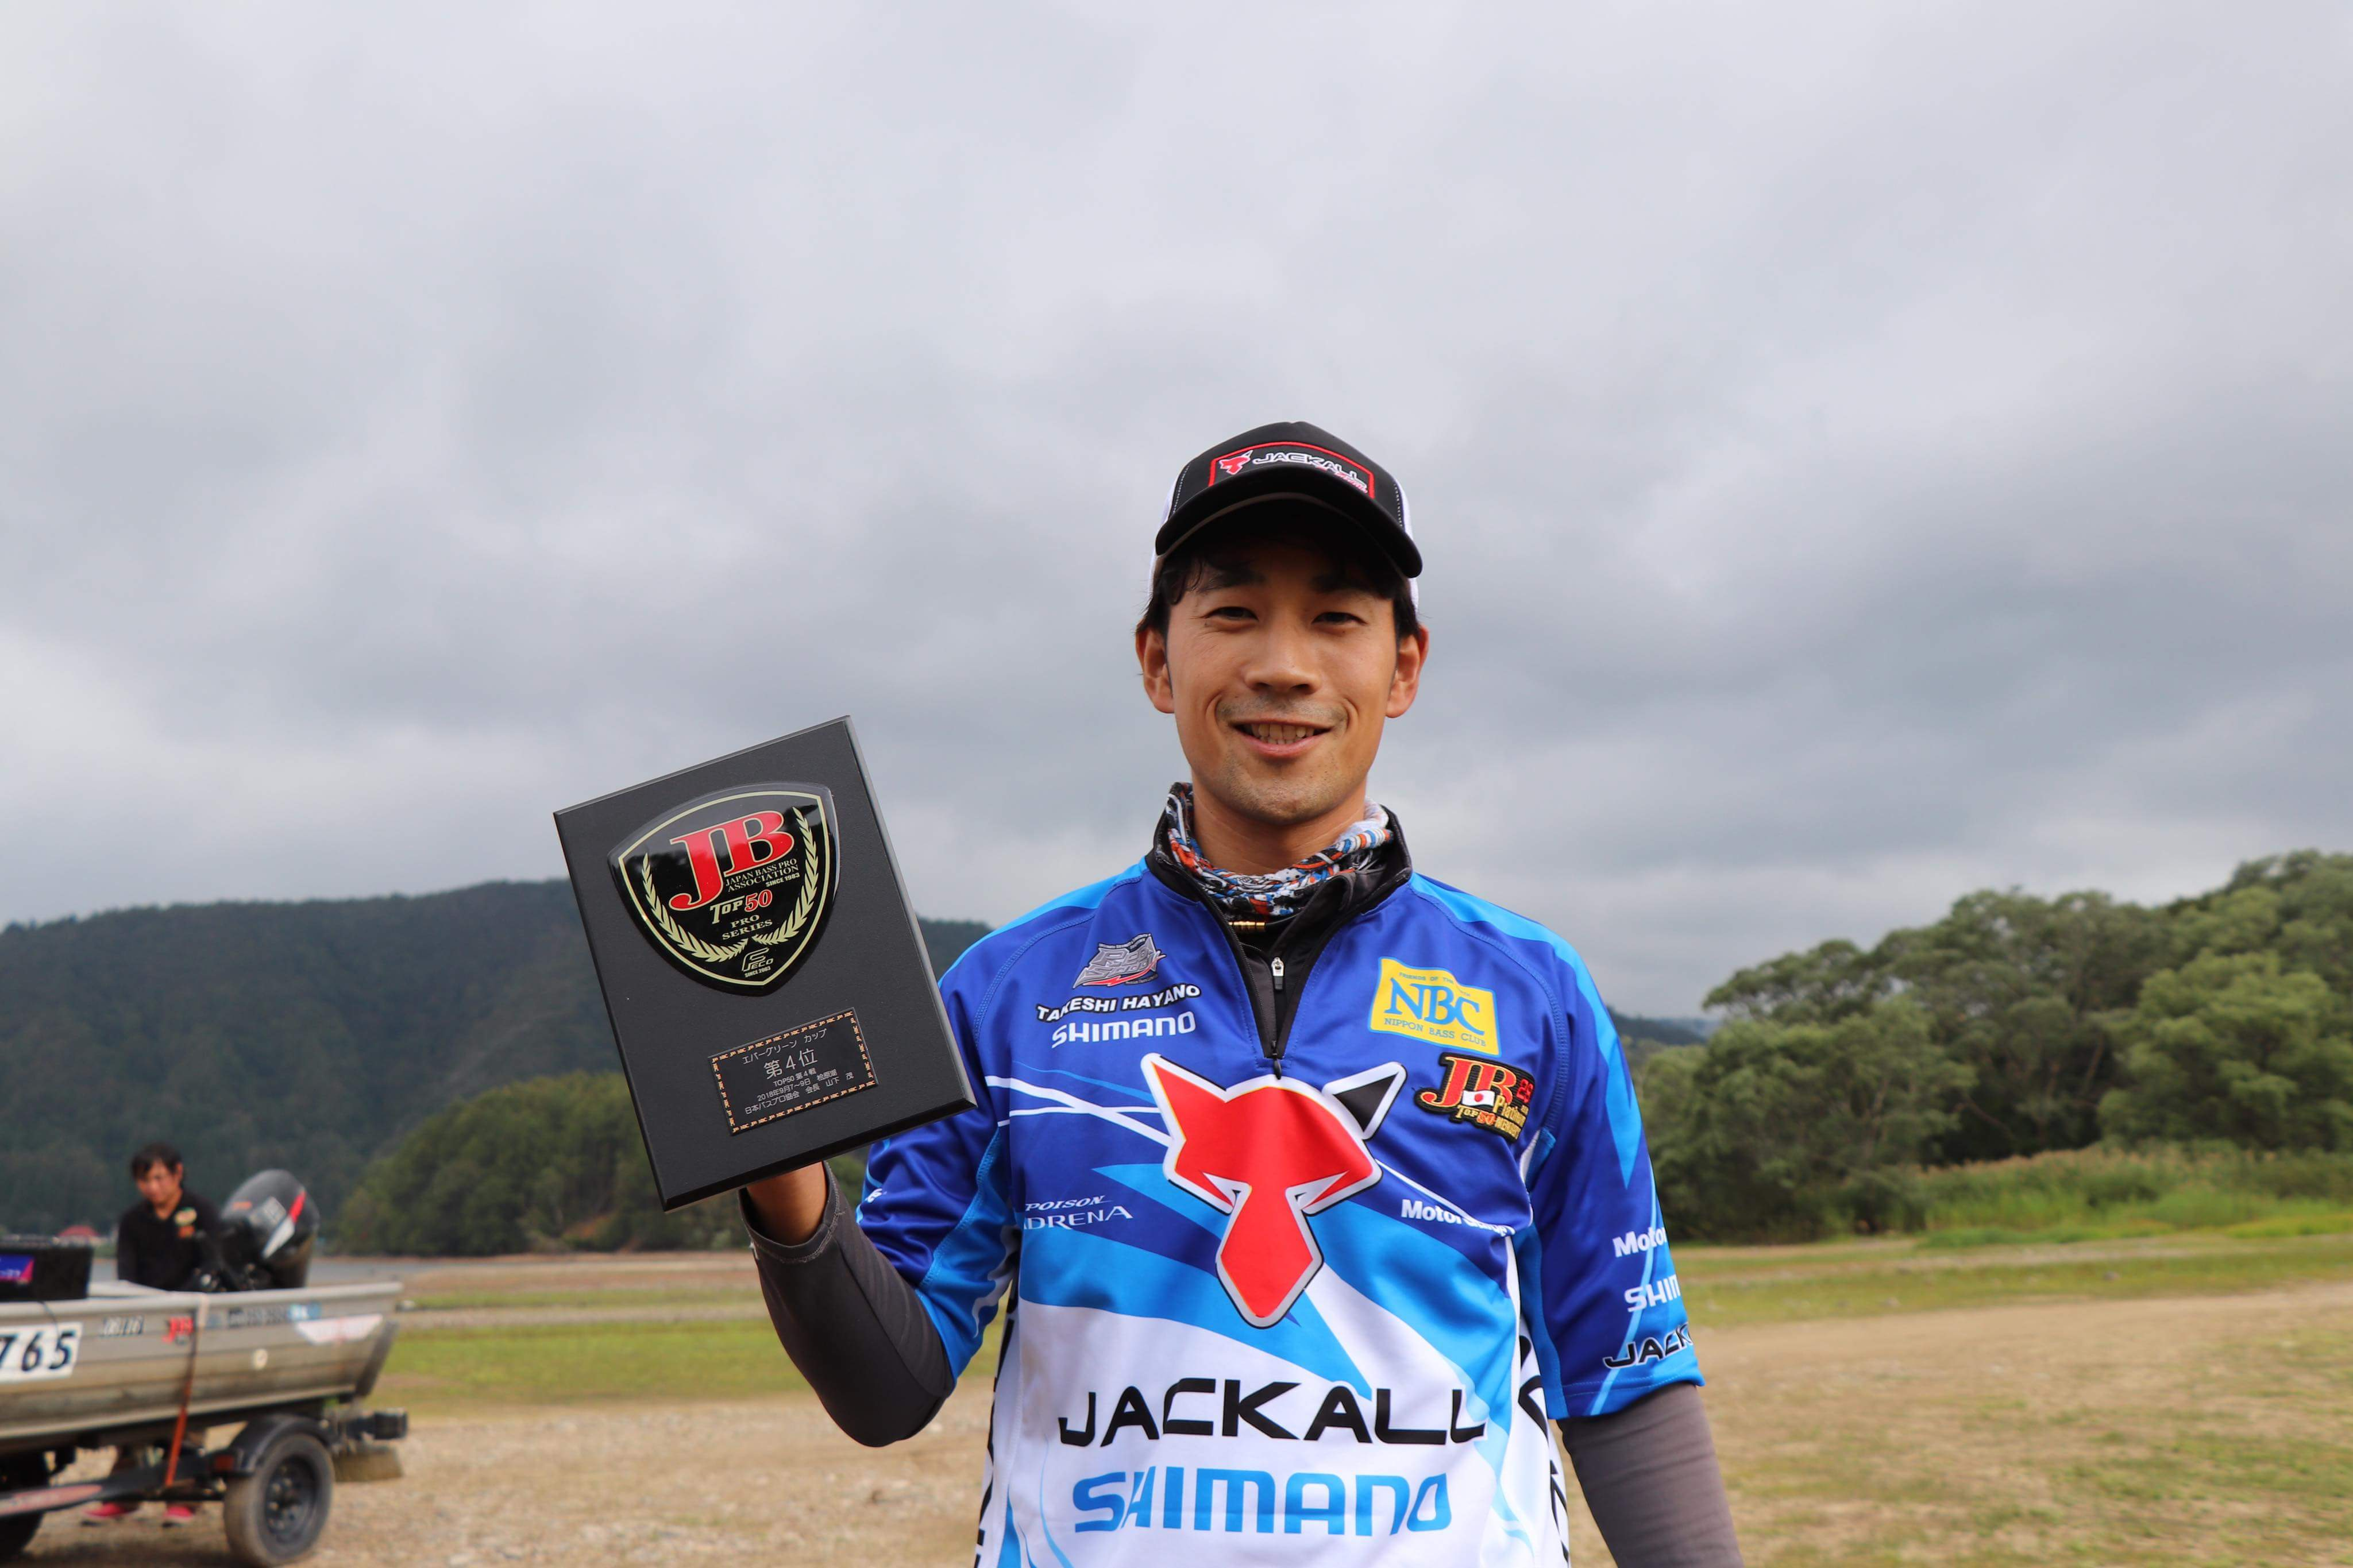 JB TOP50福島県・桧原湖戦(早野剛史)